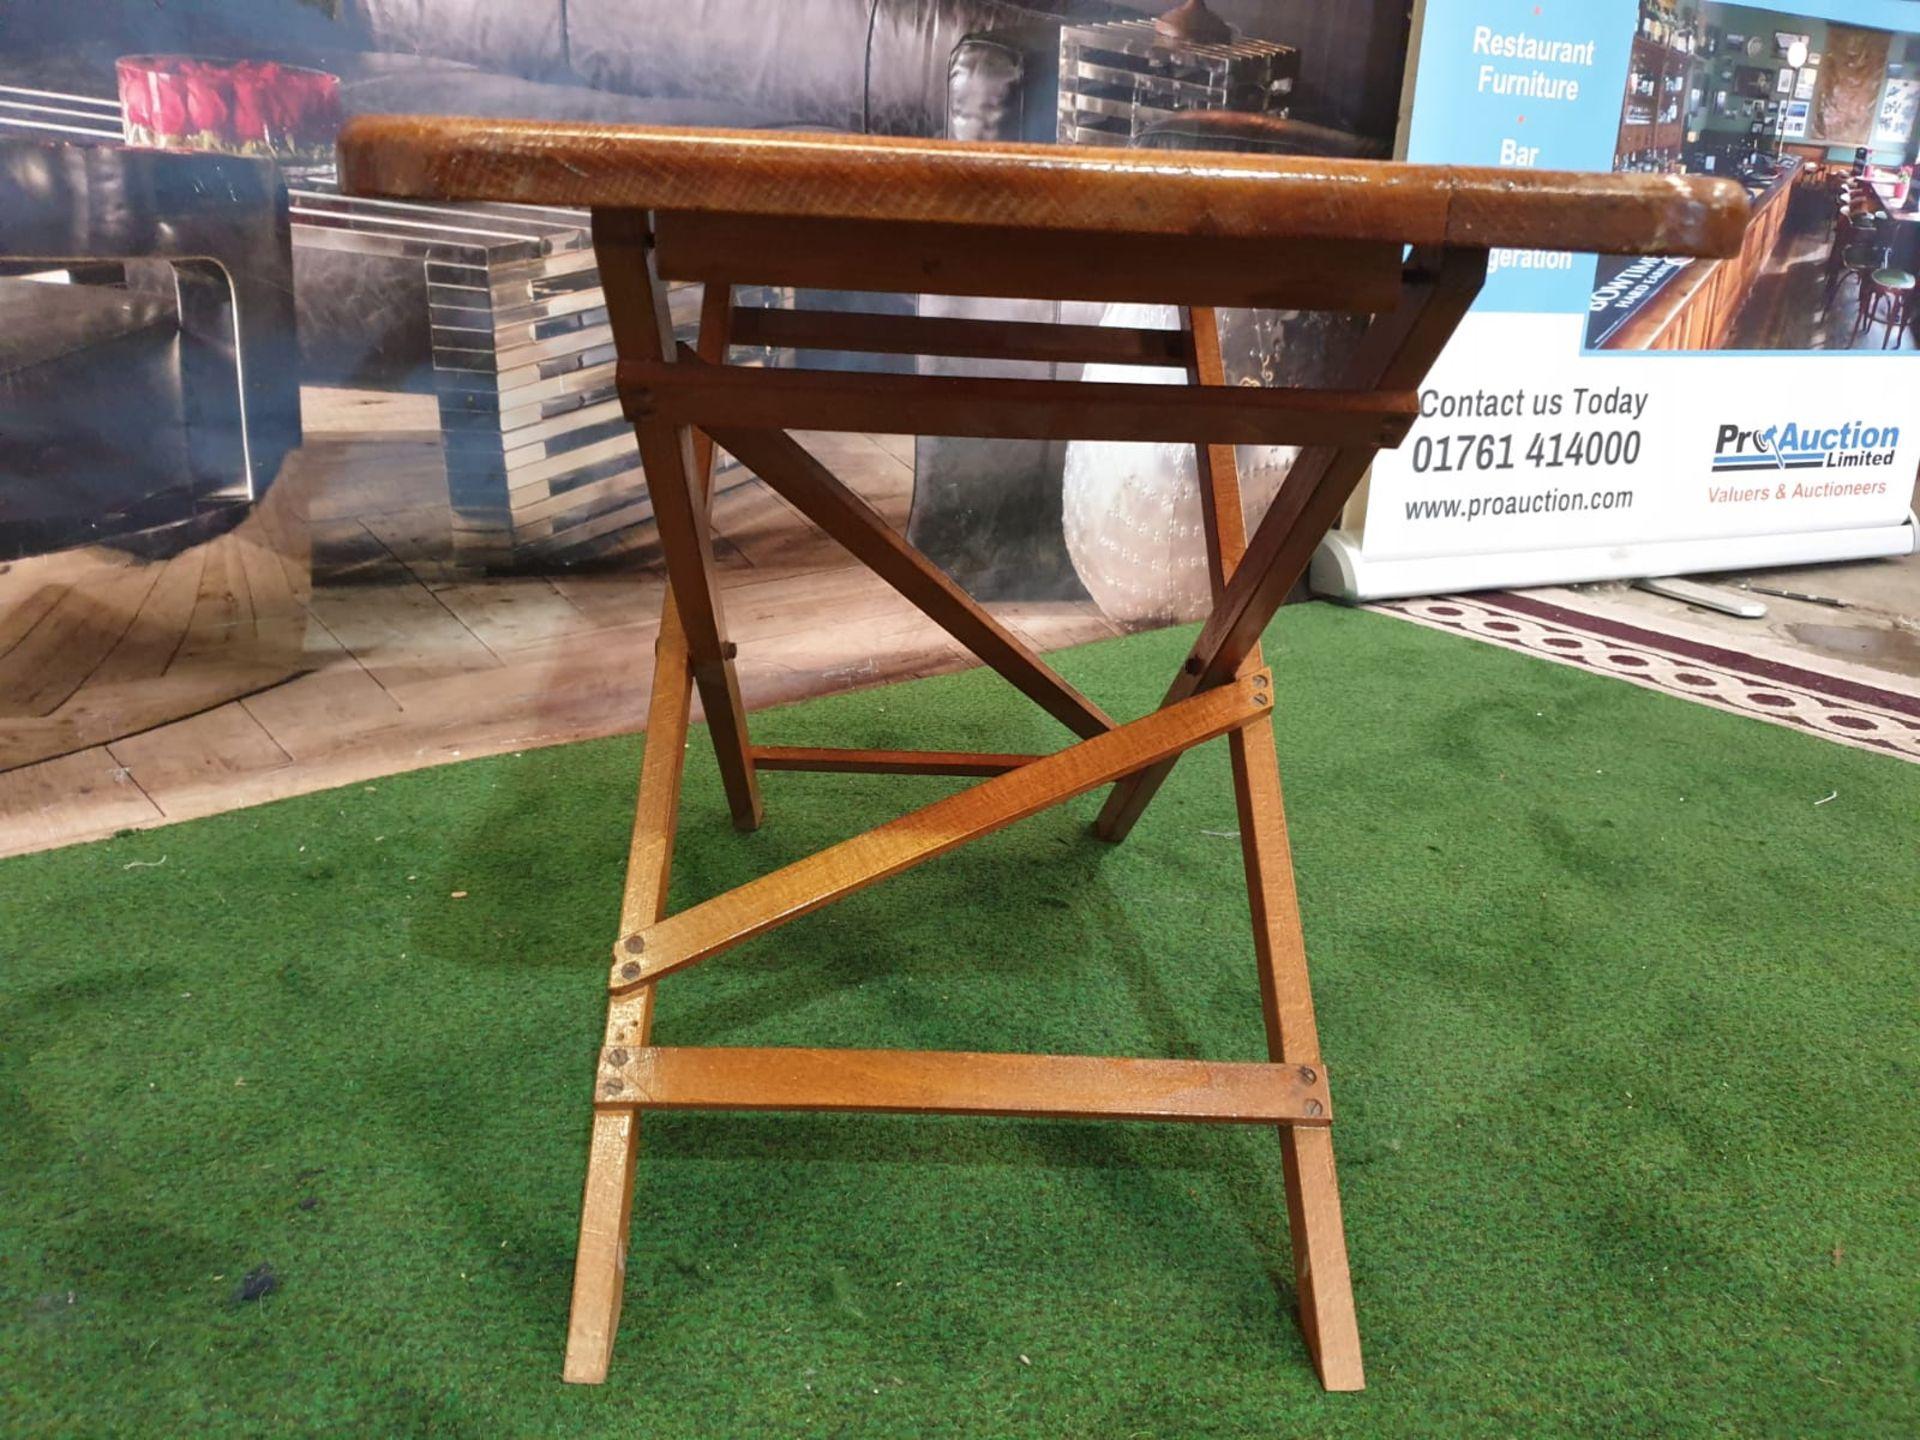 A polished teak folding table 71 x 40 x 4cm - Image 4 of 5